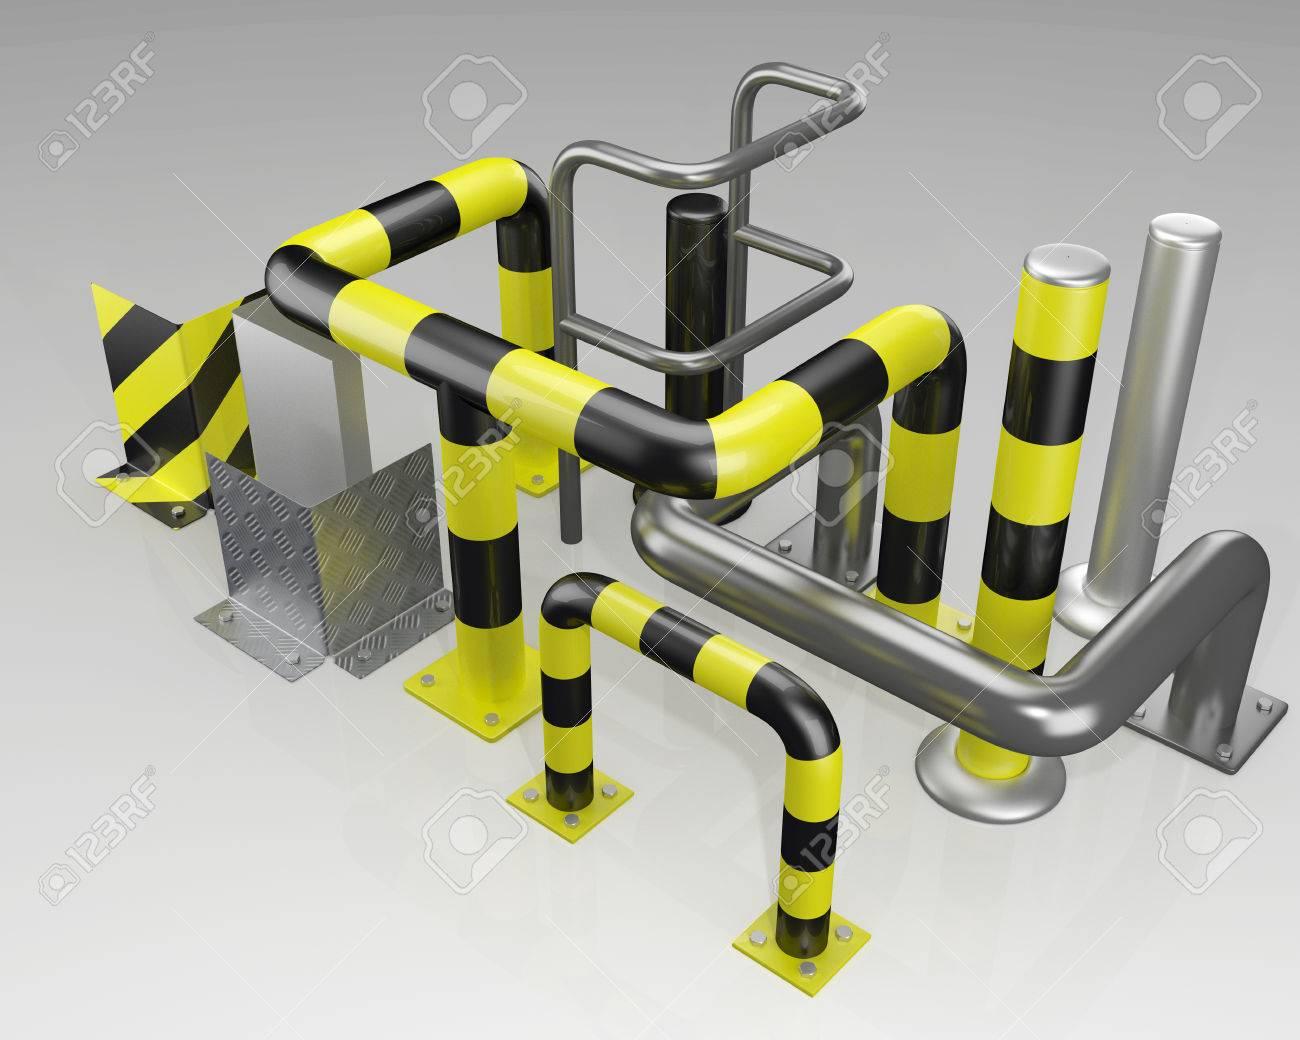 metal corner protectors and protective bars - 53633257